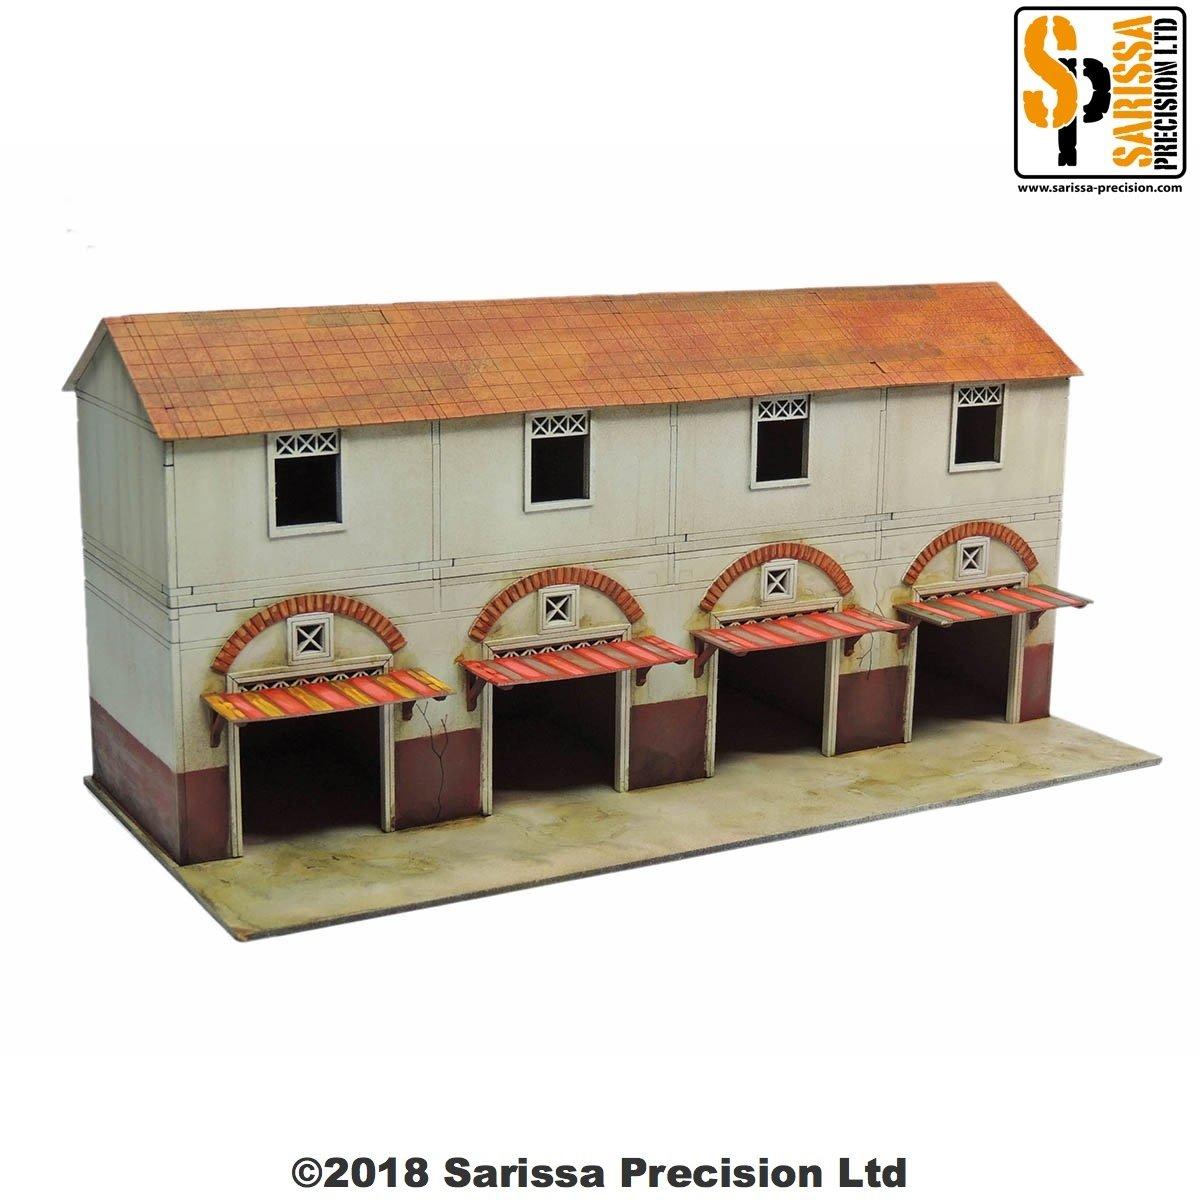 Middle Rank Shops, Sarissa Precision